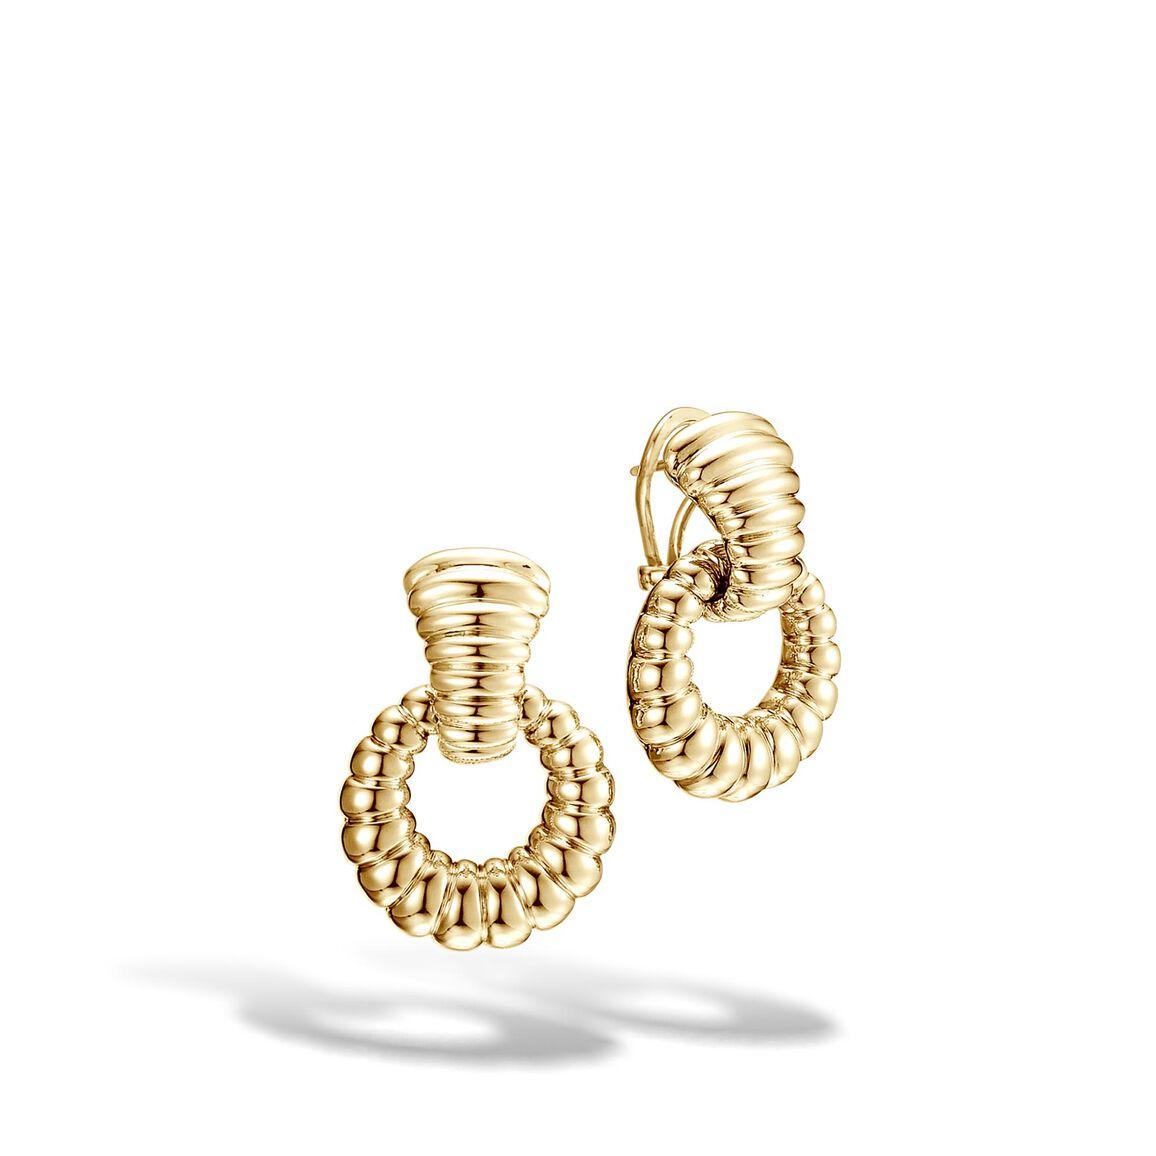 Classic Chain Door Knocker Earring in 18K Gold